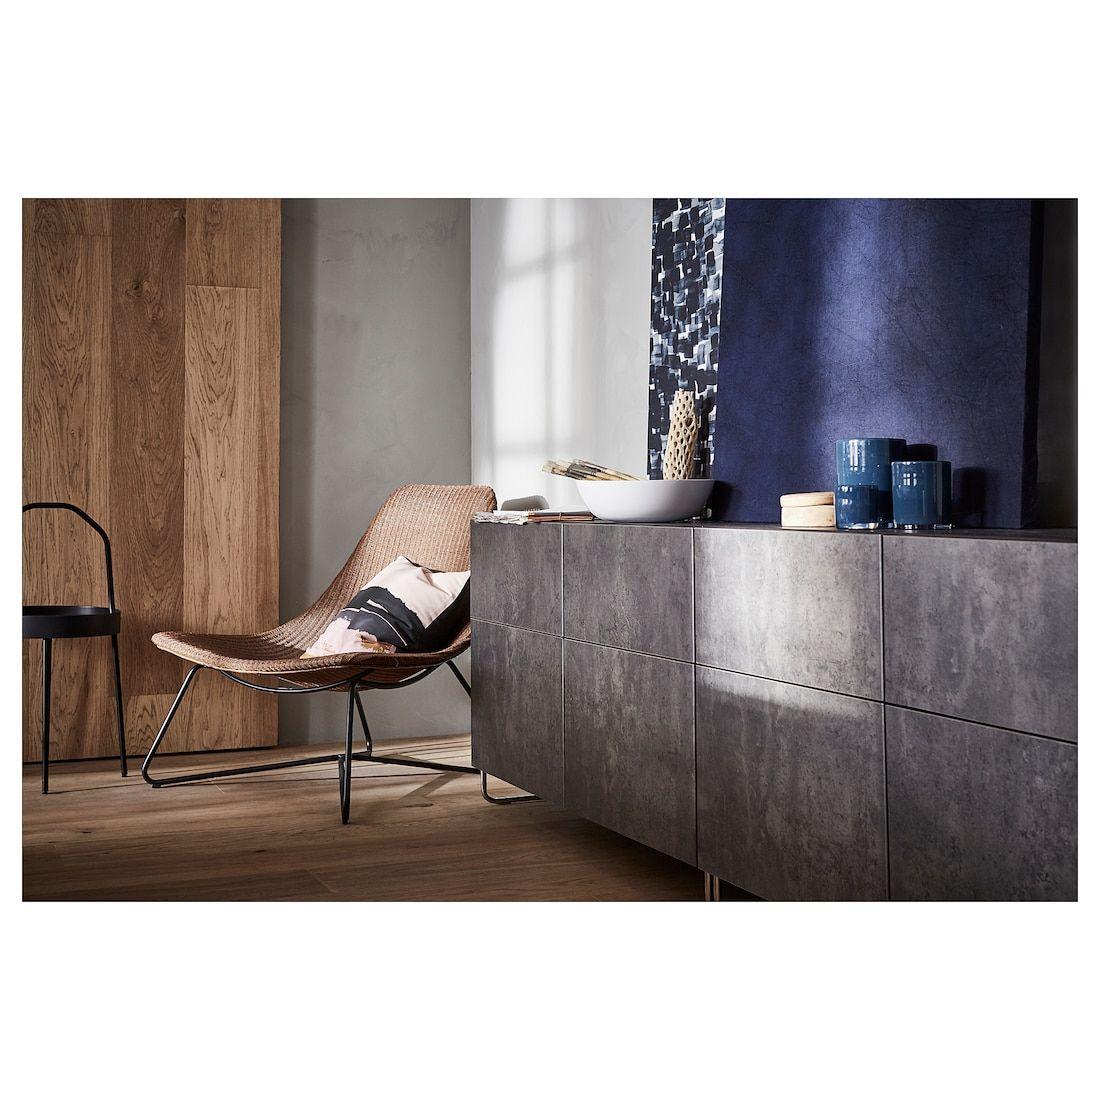 Besta Combi Rgt Portes Tiroirs Brun Noir Kallviken Sularp Gris Fonce Imitation Ciment Ikea Ikea Mobilier De Salon Meuble Deco